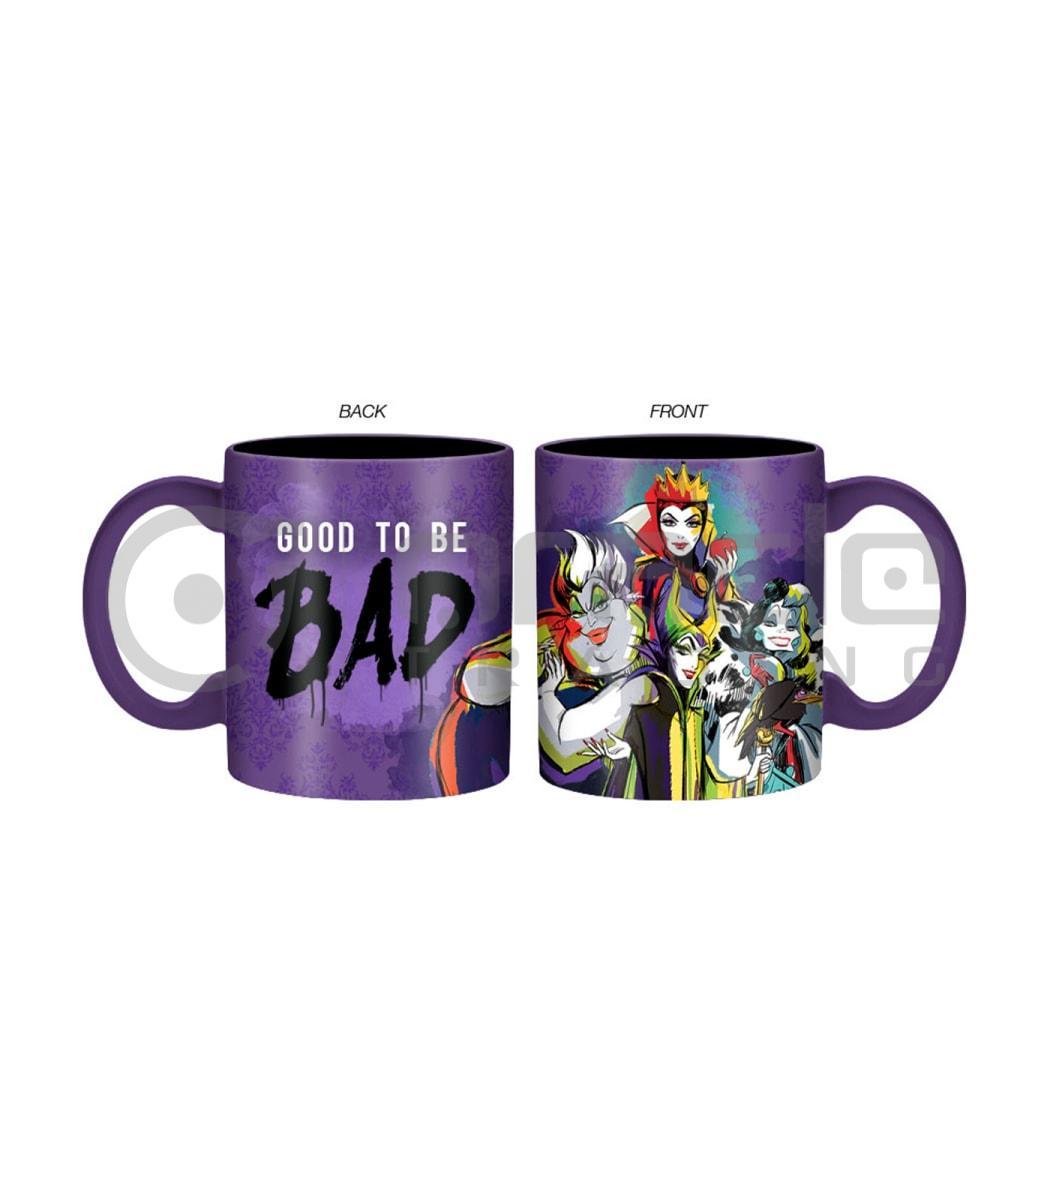 Disney Villains Jumbo Mug - Good to be Bad